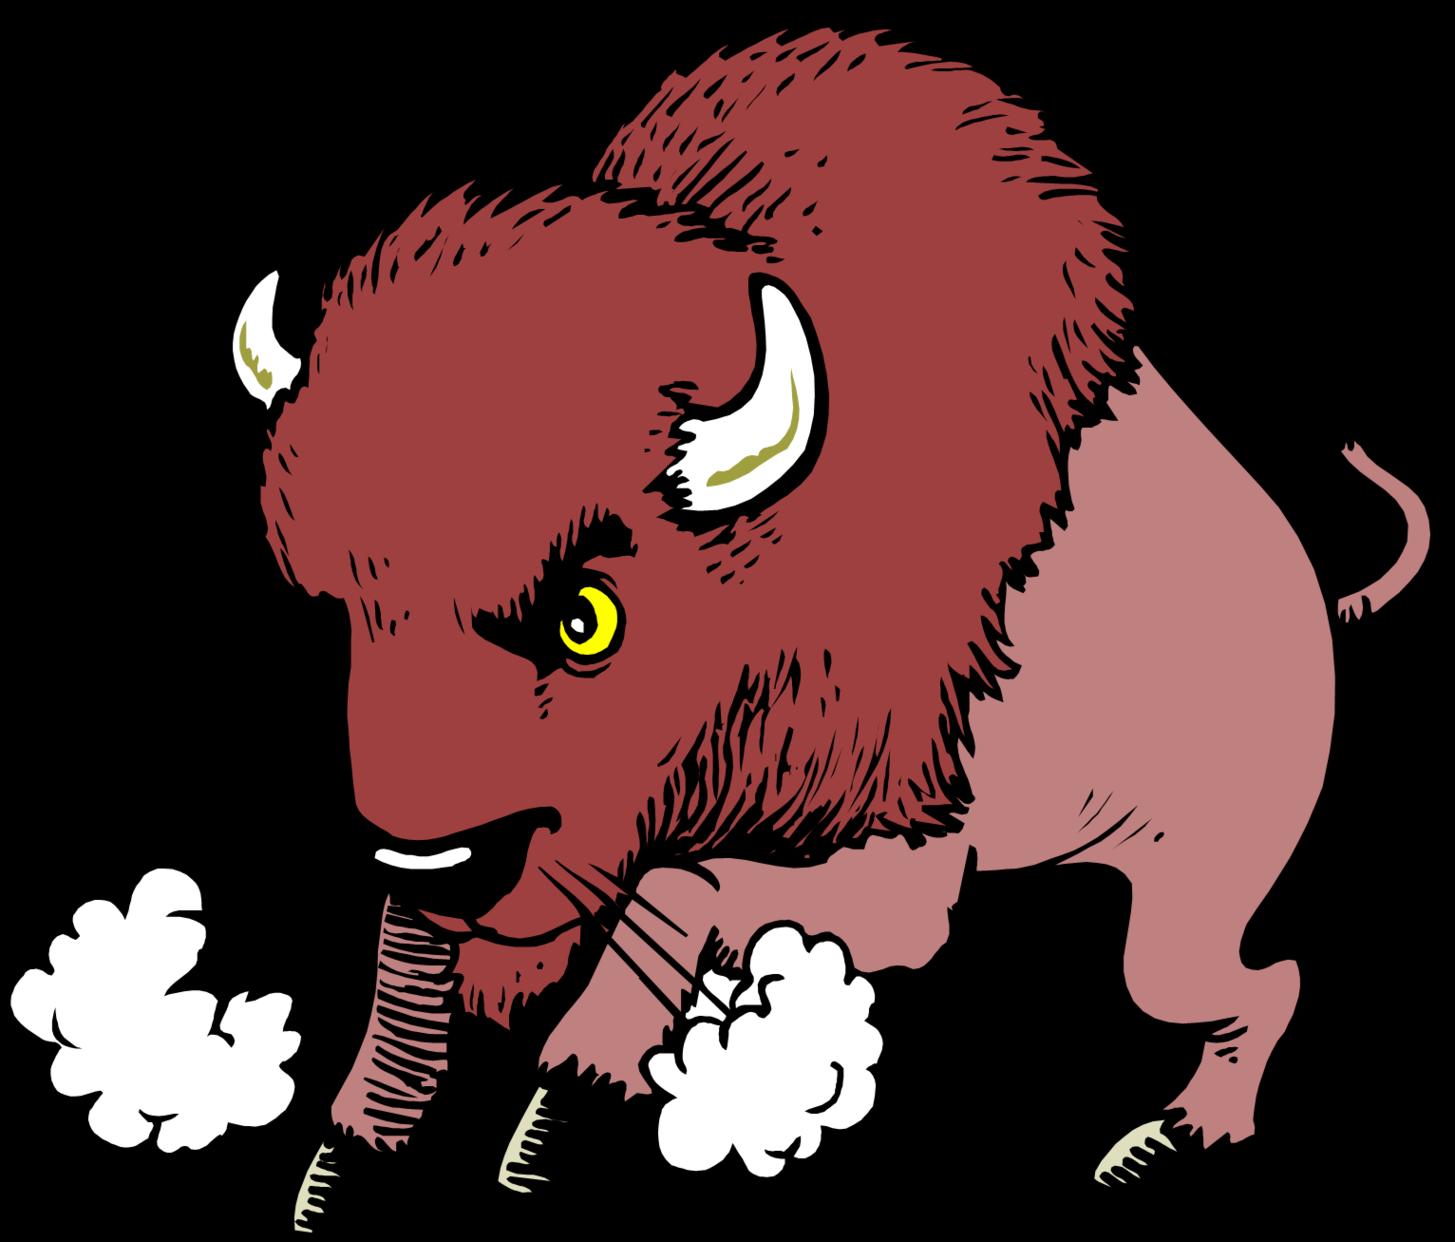 bison clipart #75-bison clipart #75-16